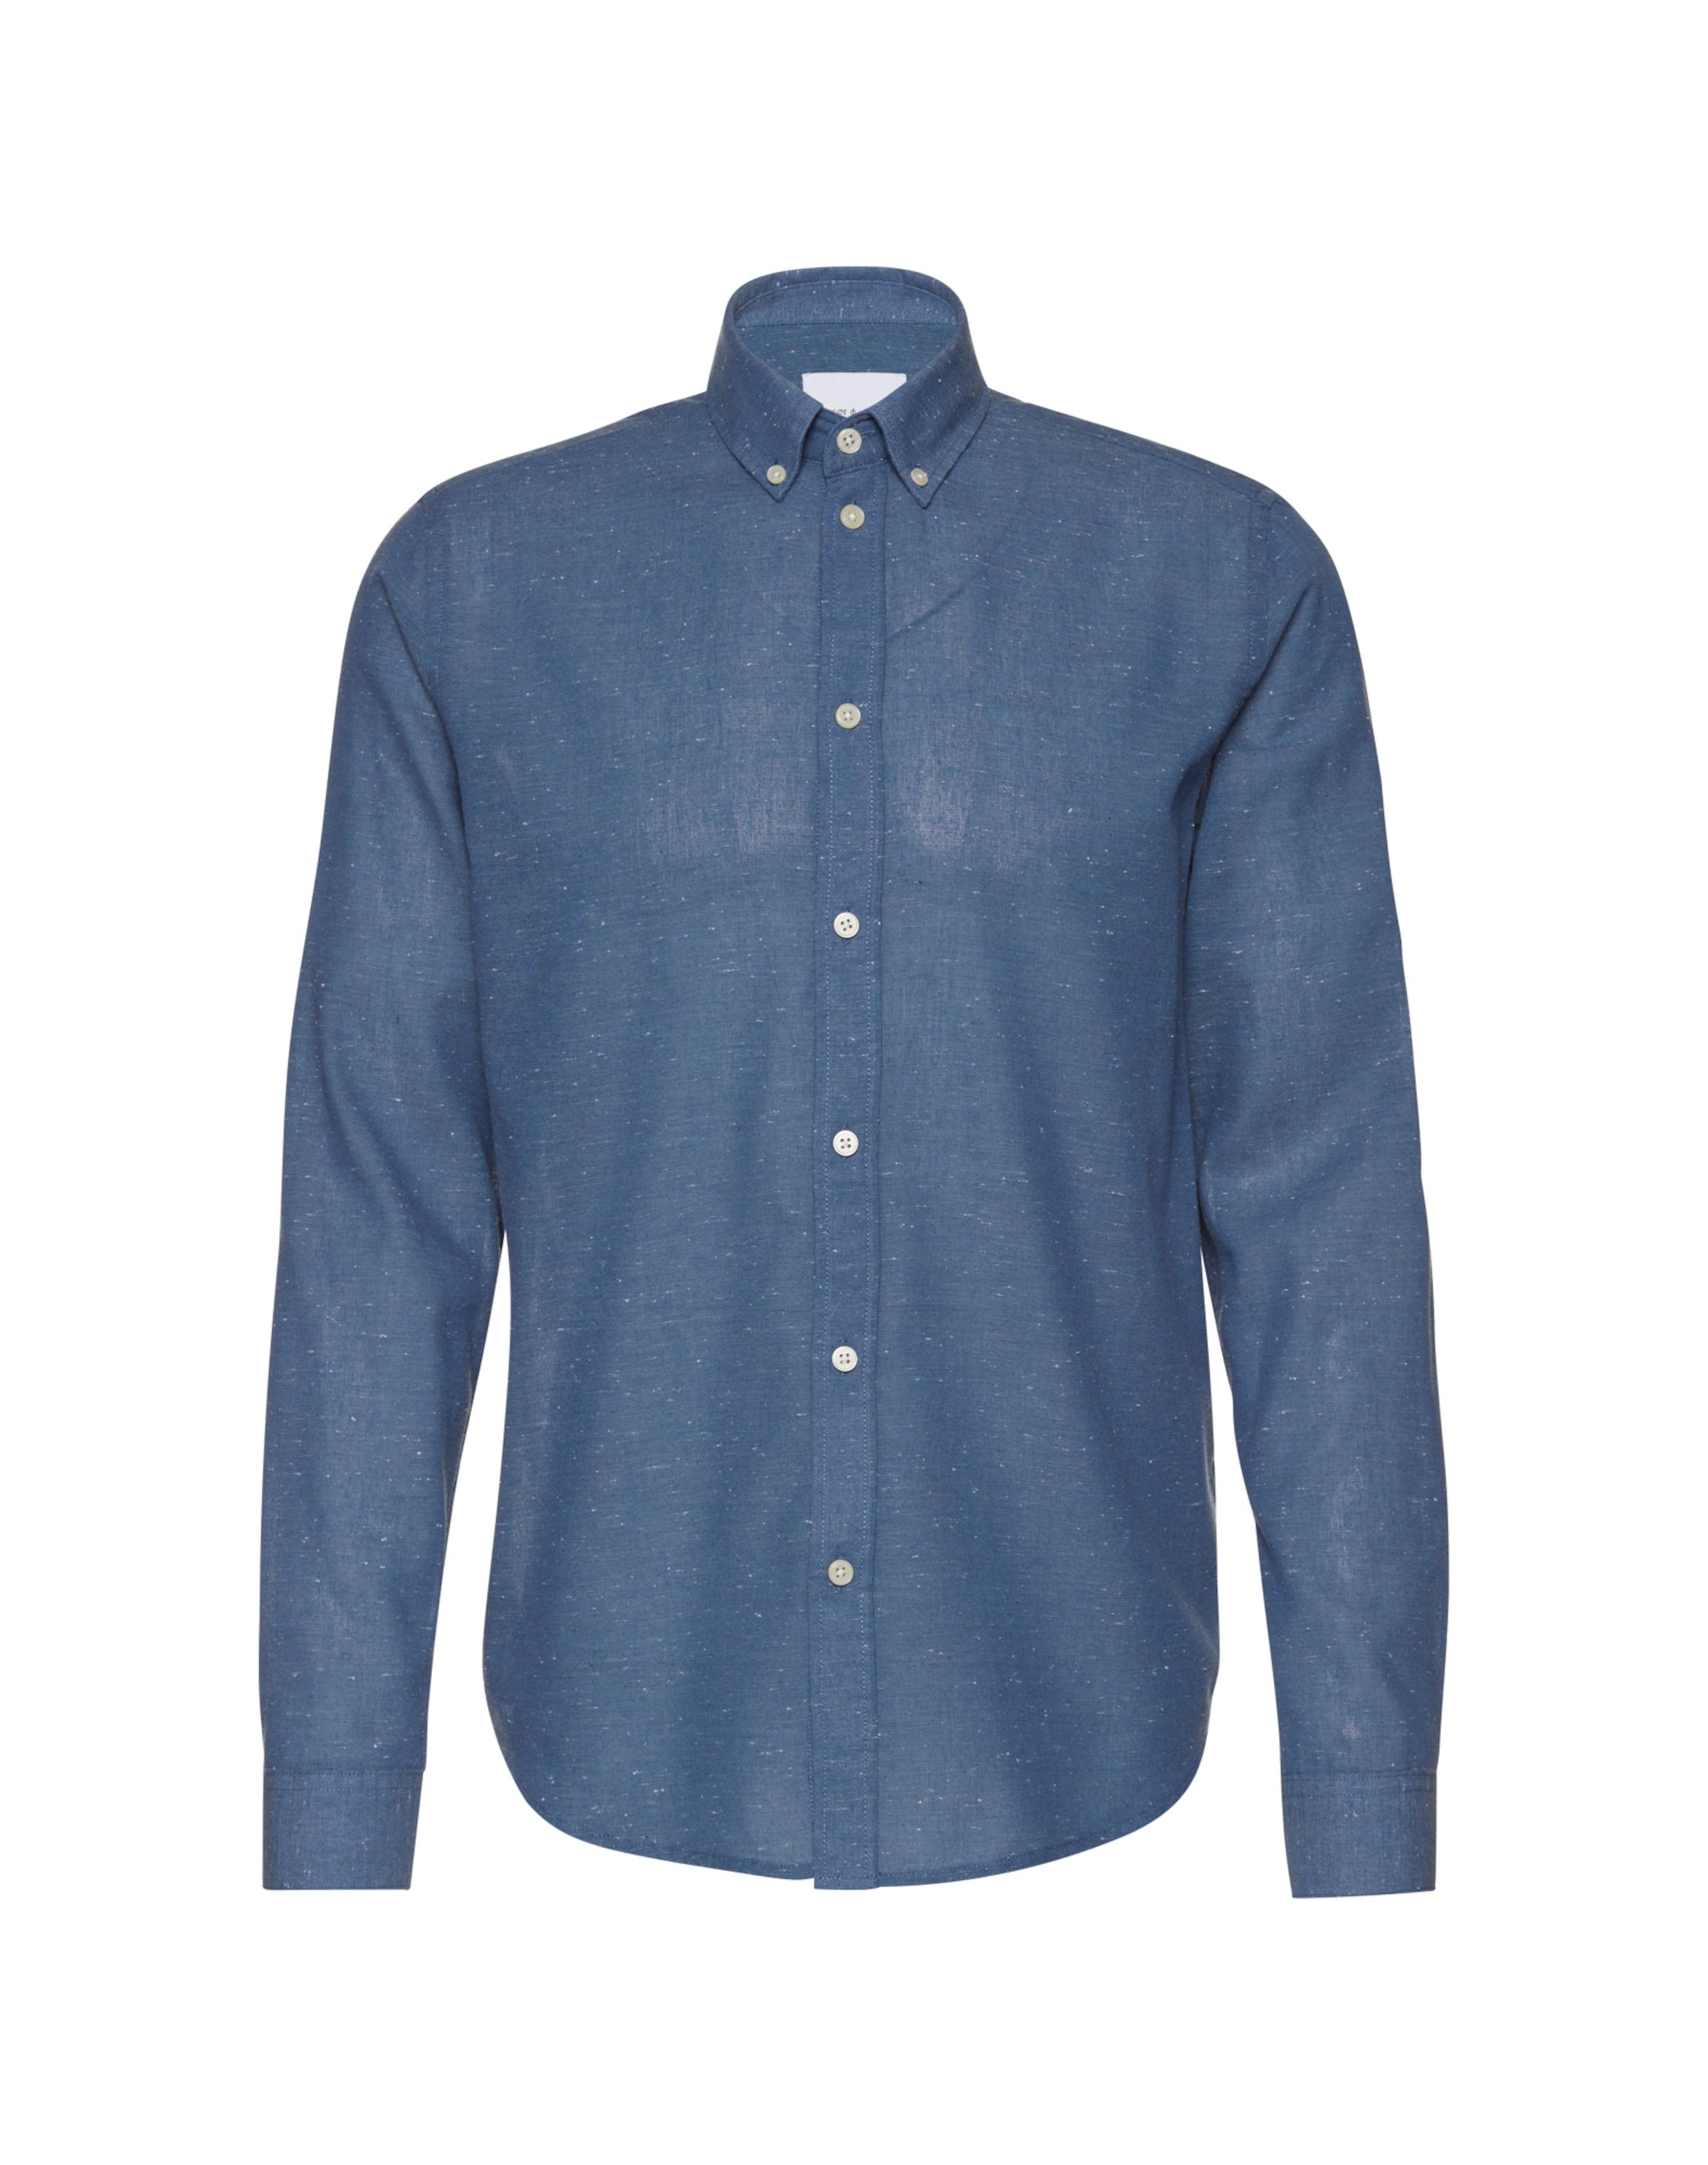 Samsoe & Samsoe Hemd mit Button-Down-Kragen 'LiamBX 8003' Rabatt Niedriger Versand MEACdmqS